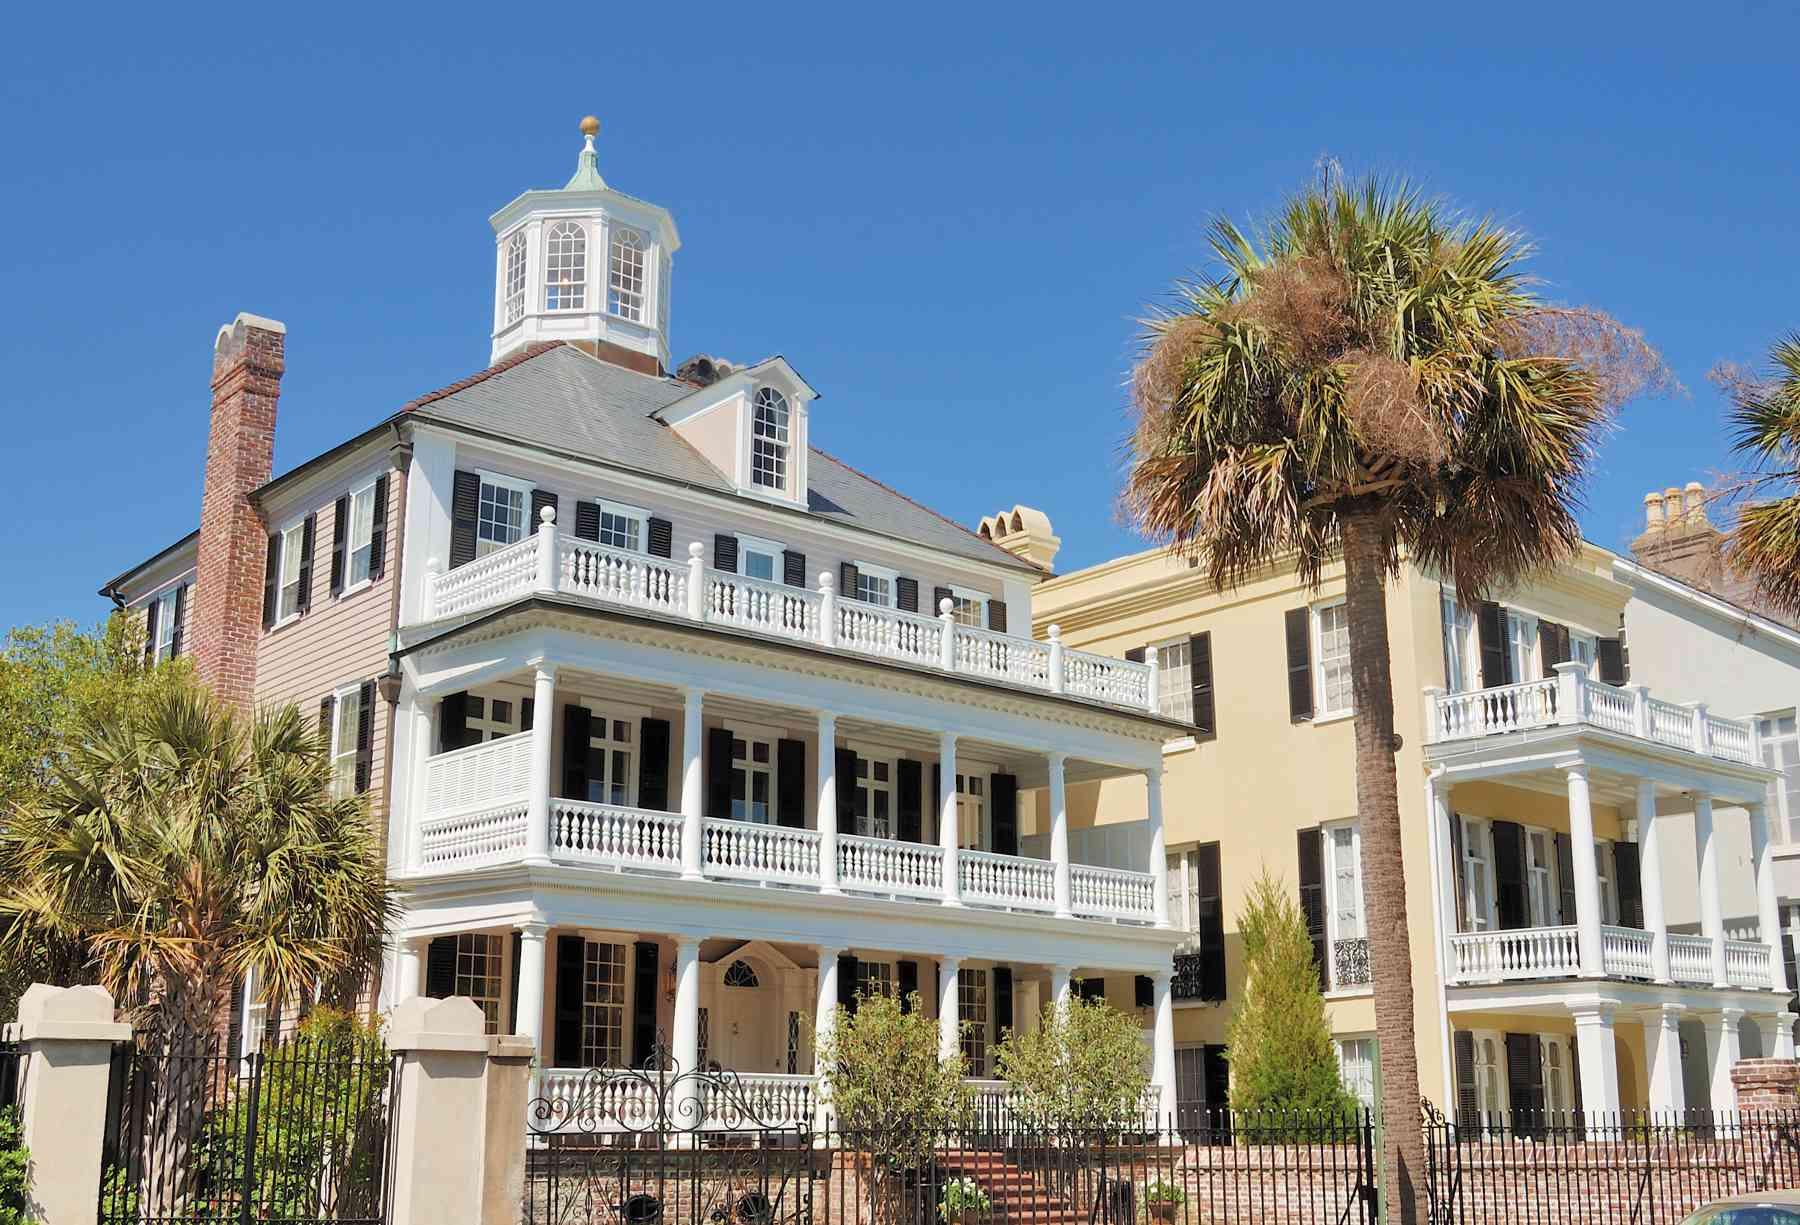 A Charleston double house.